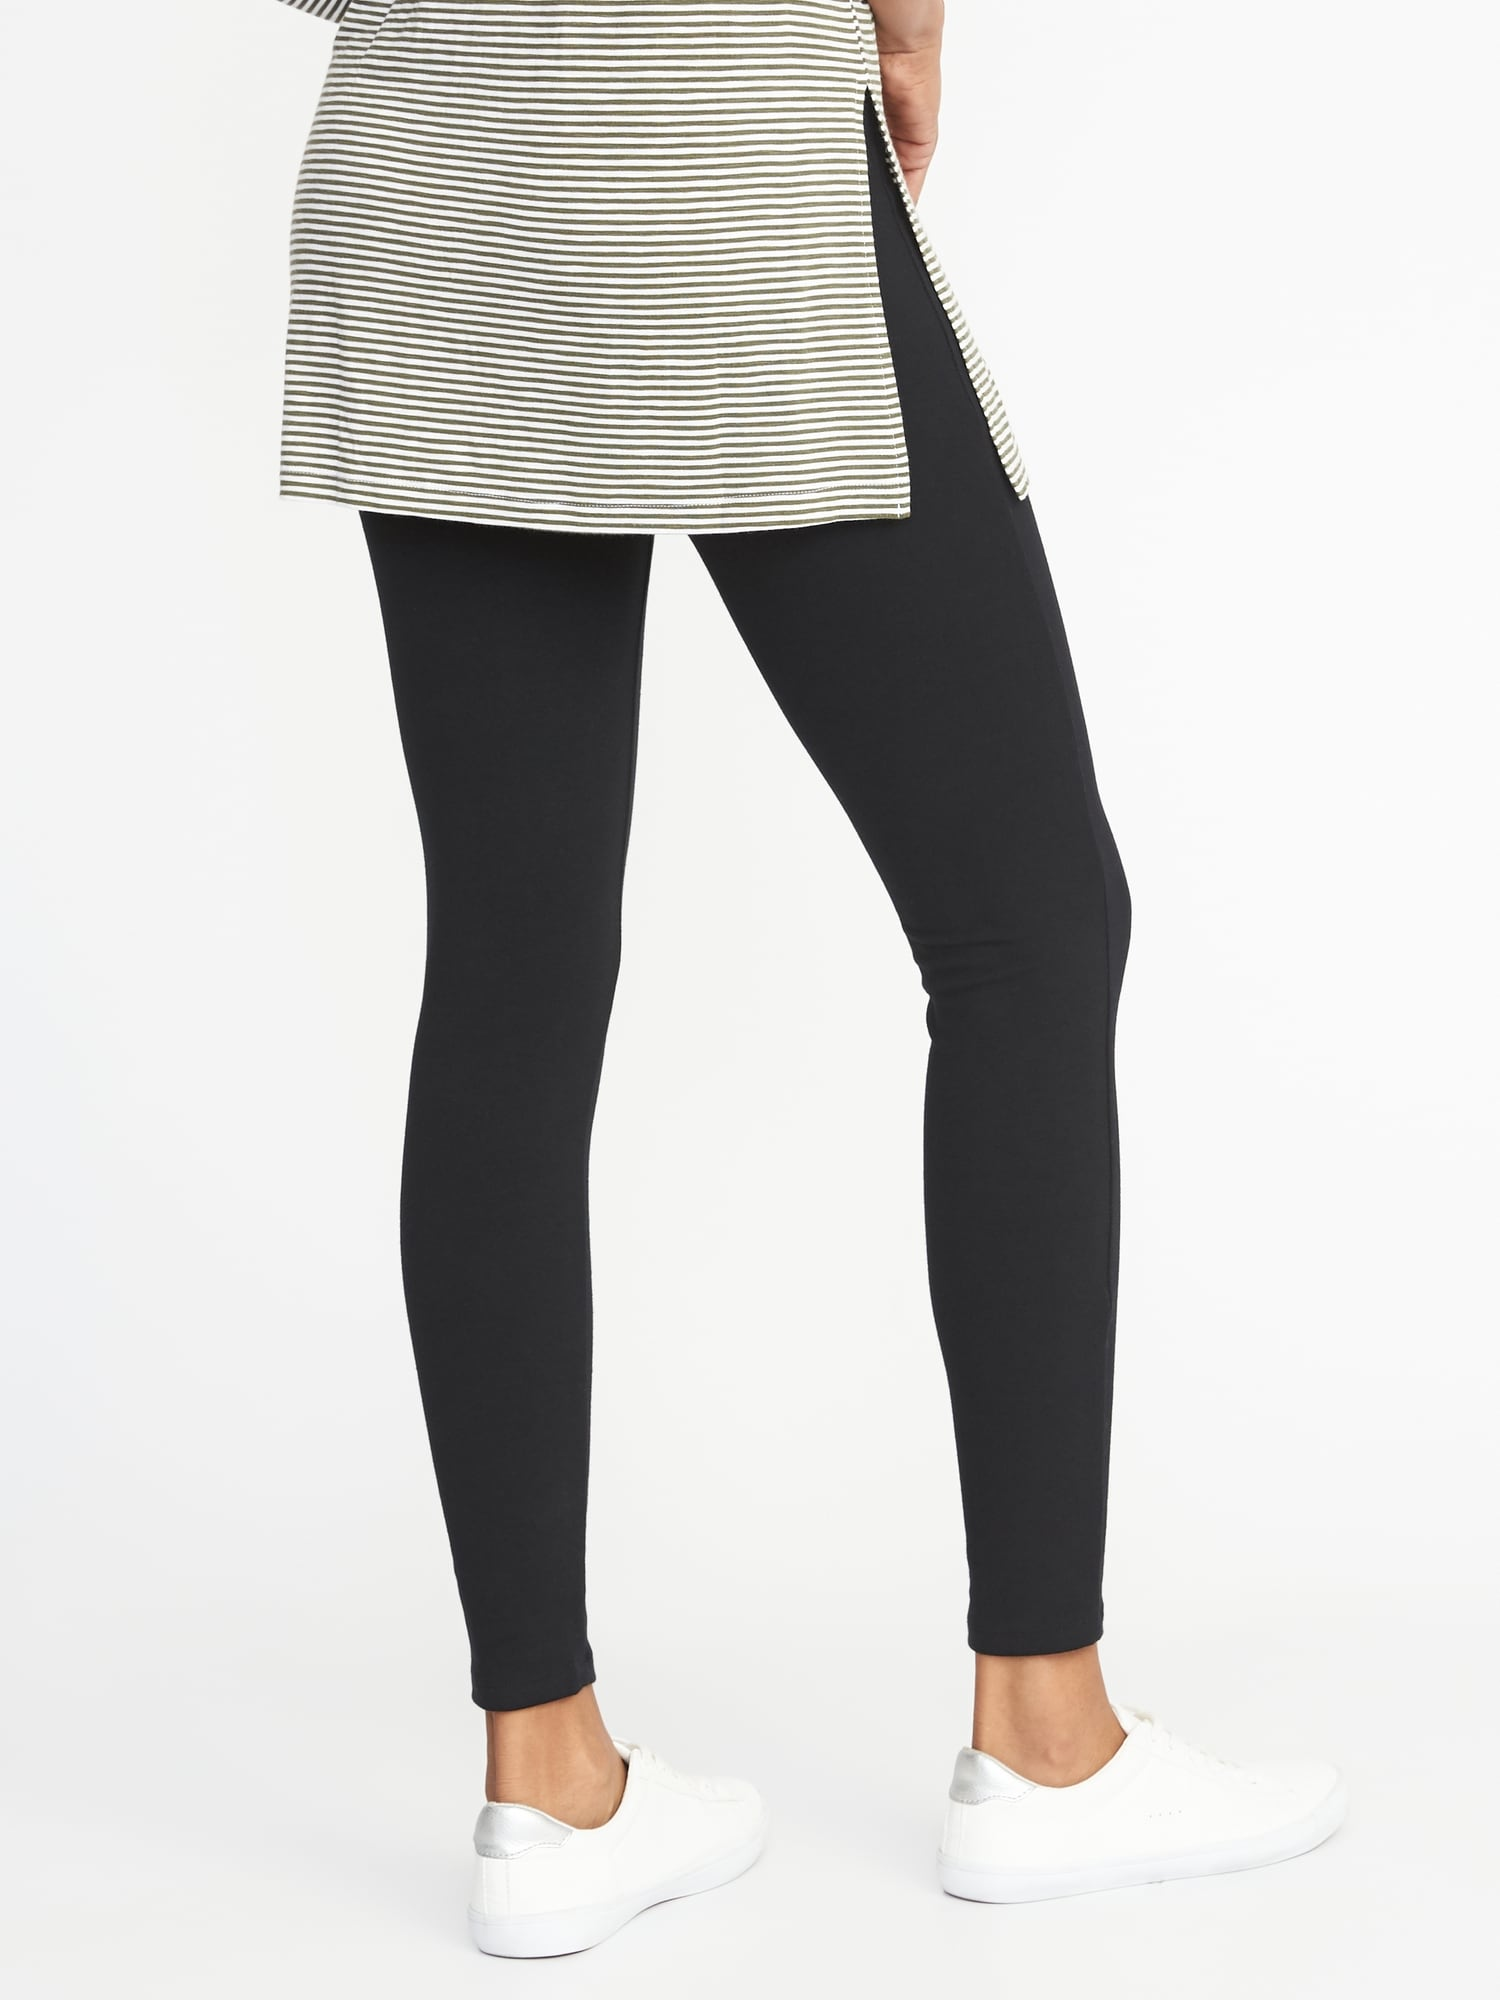 ac78a5ffa63a5c Jersey Elastic-Waist Leggings for Women   Old Navy